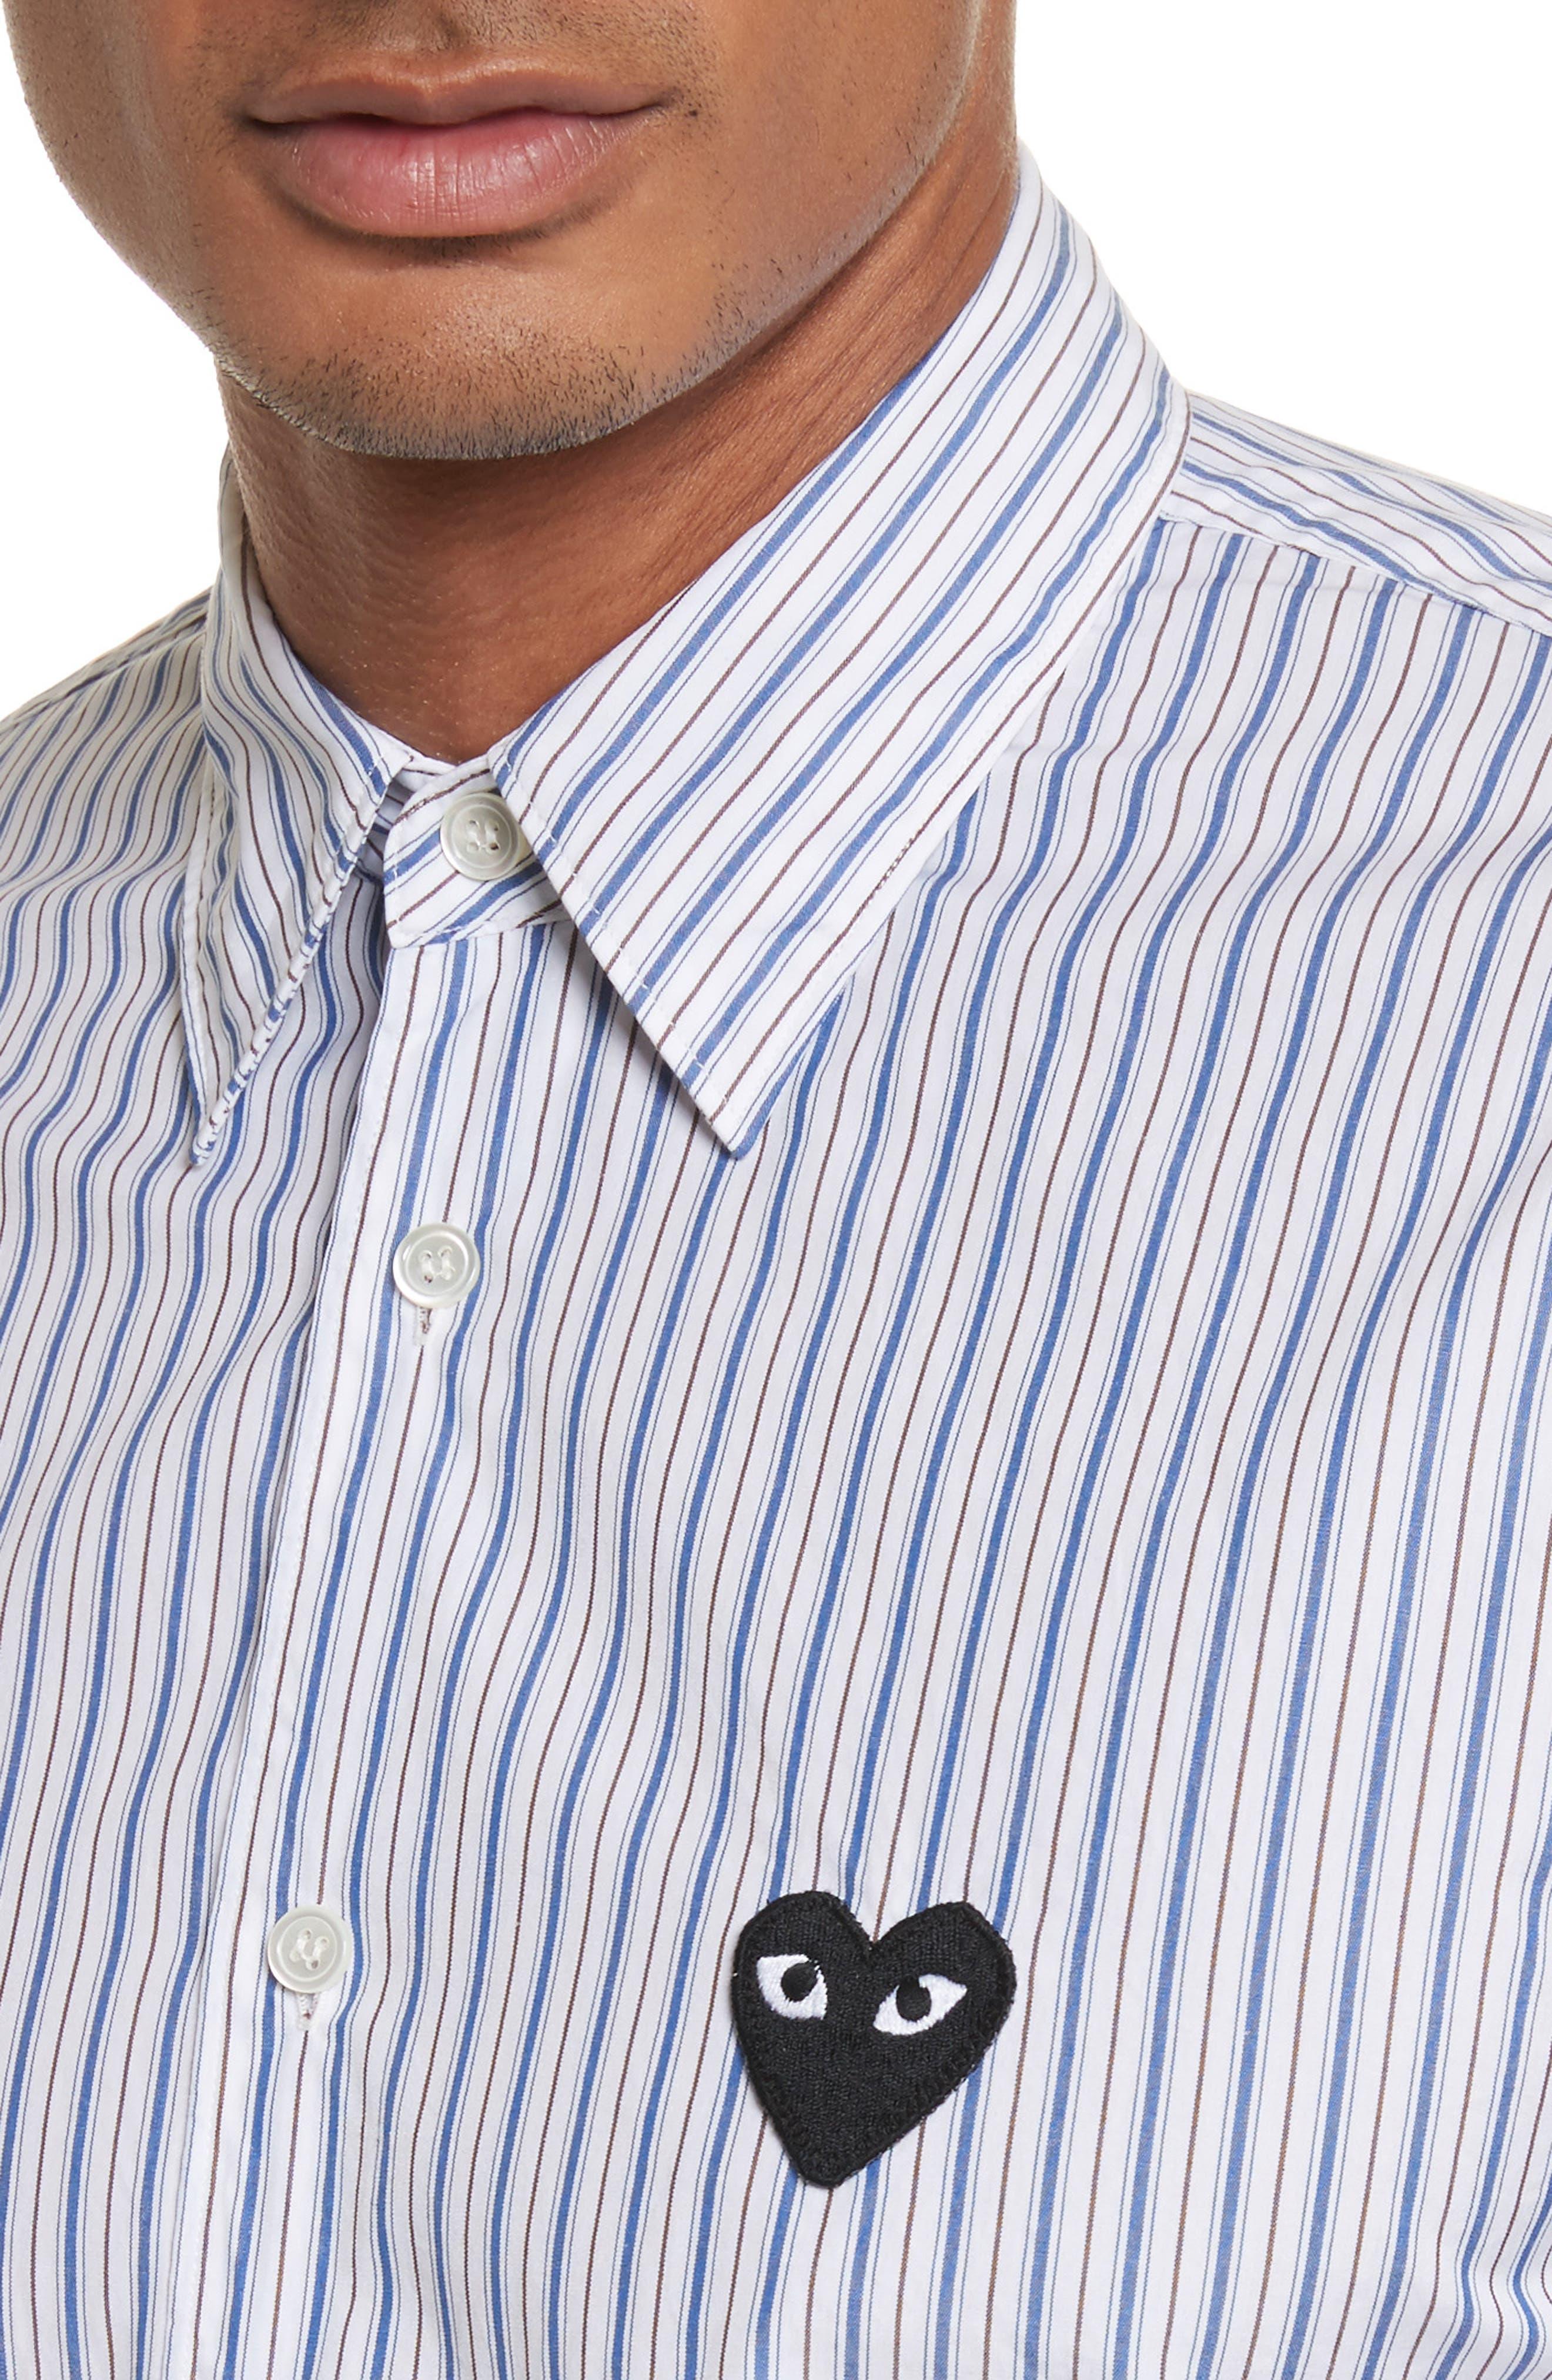 PLAY Black Heart Stripe Oxford Shirt,                             Alternate thumbnail 4, color,                             Blue